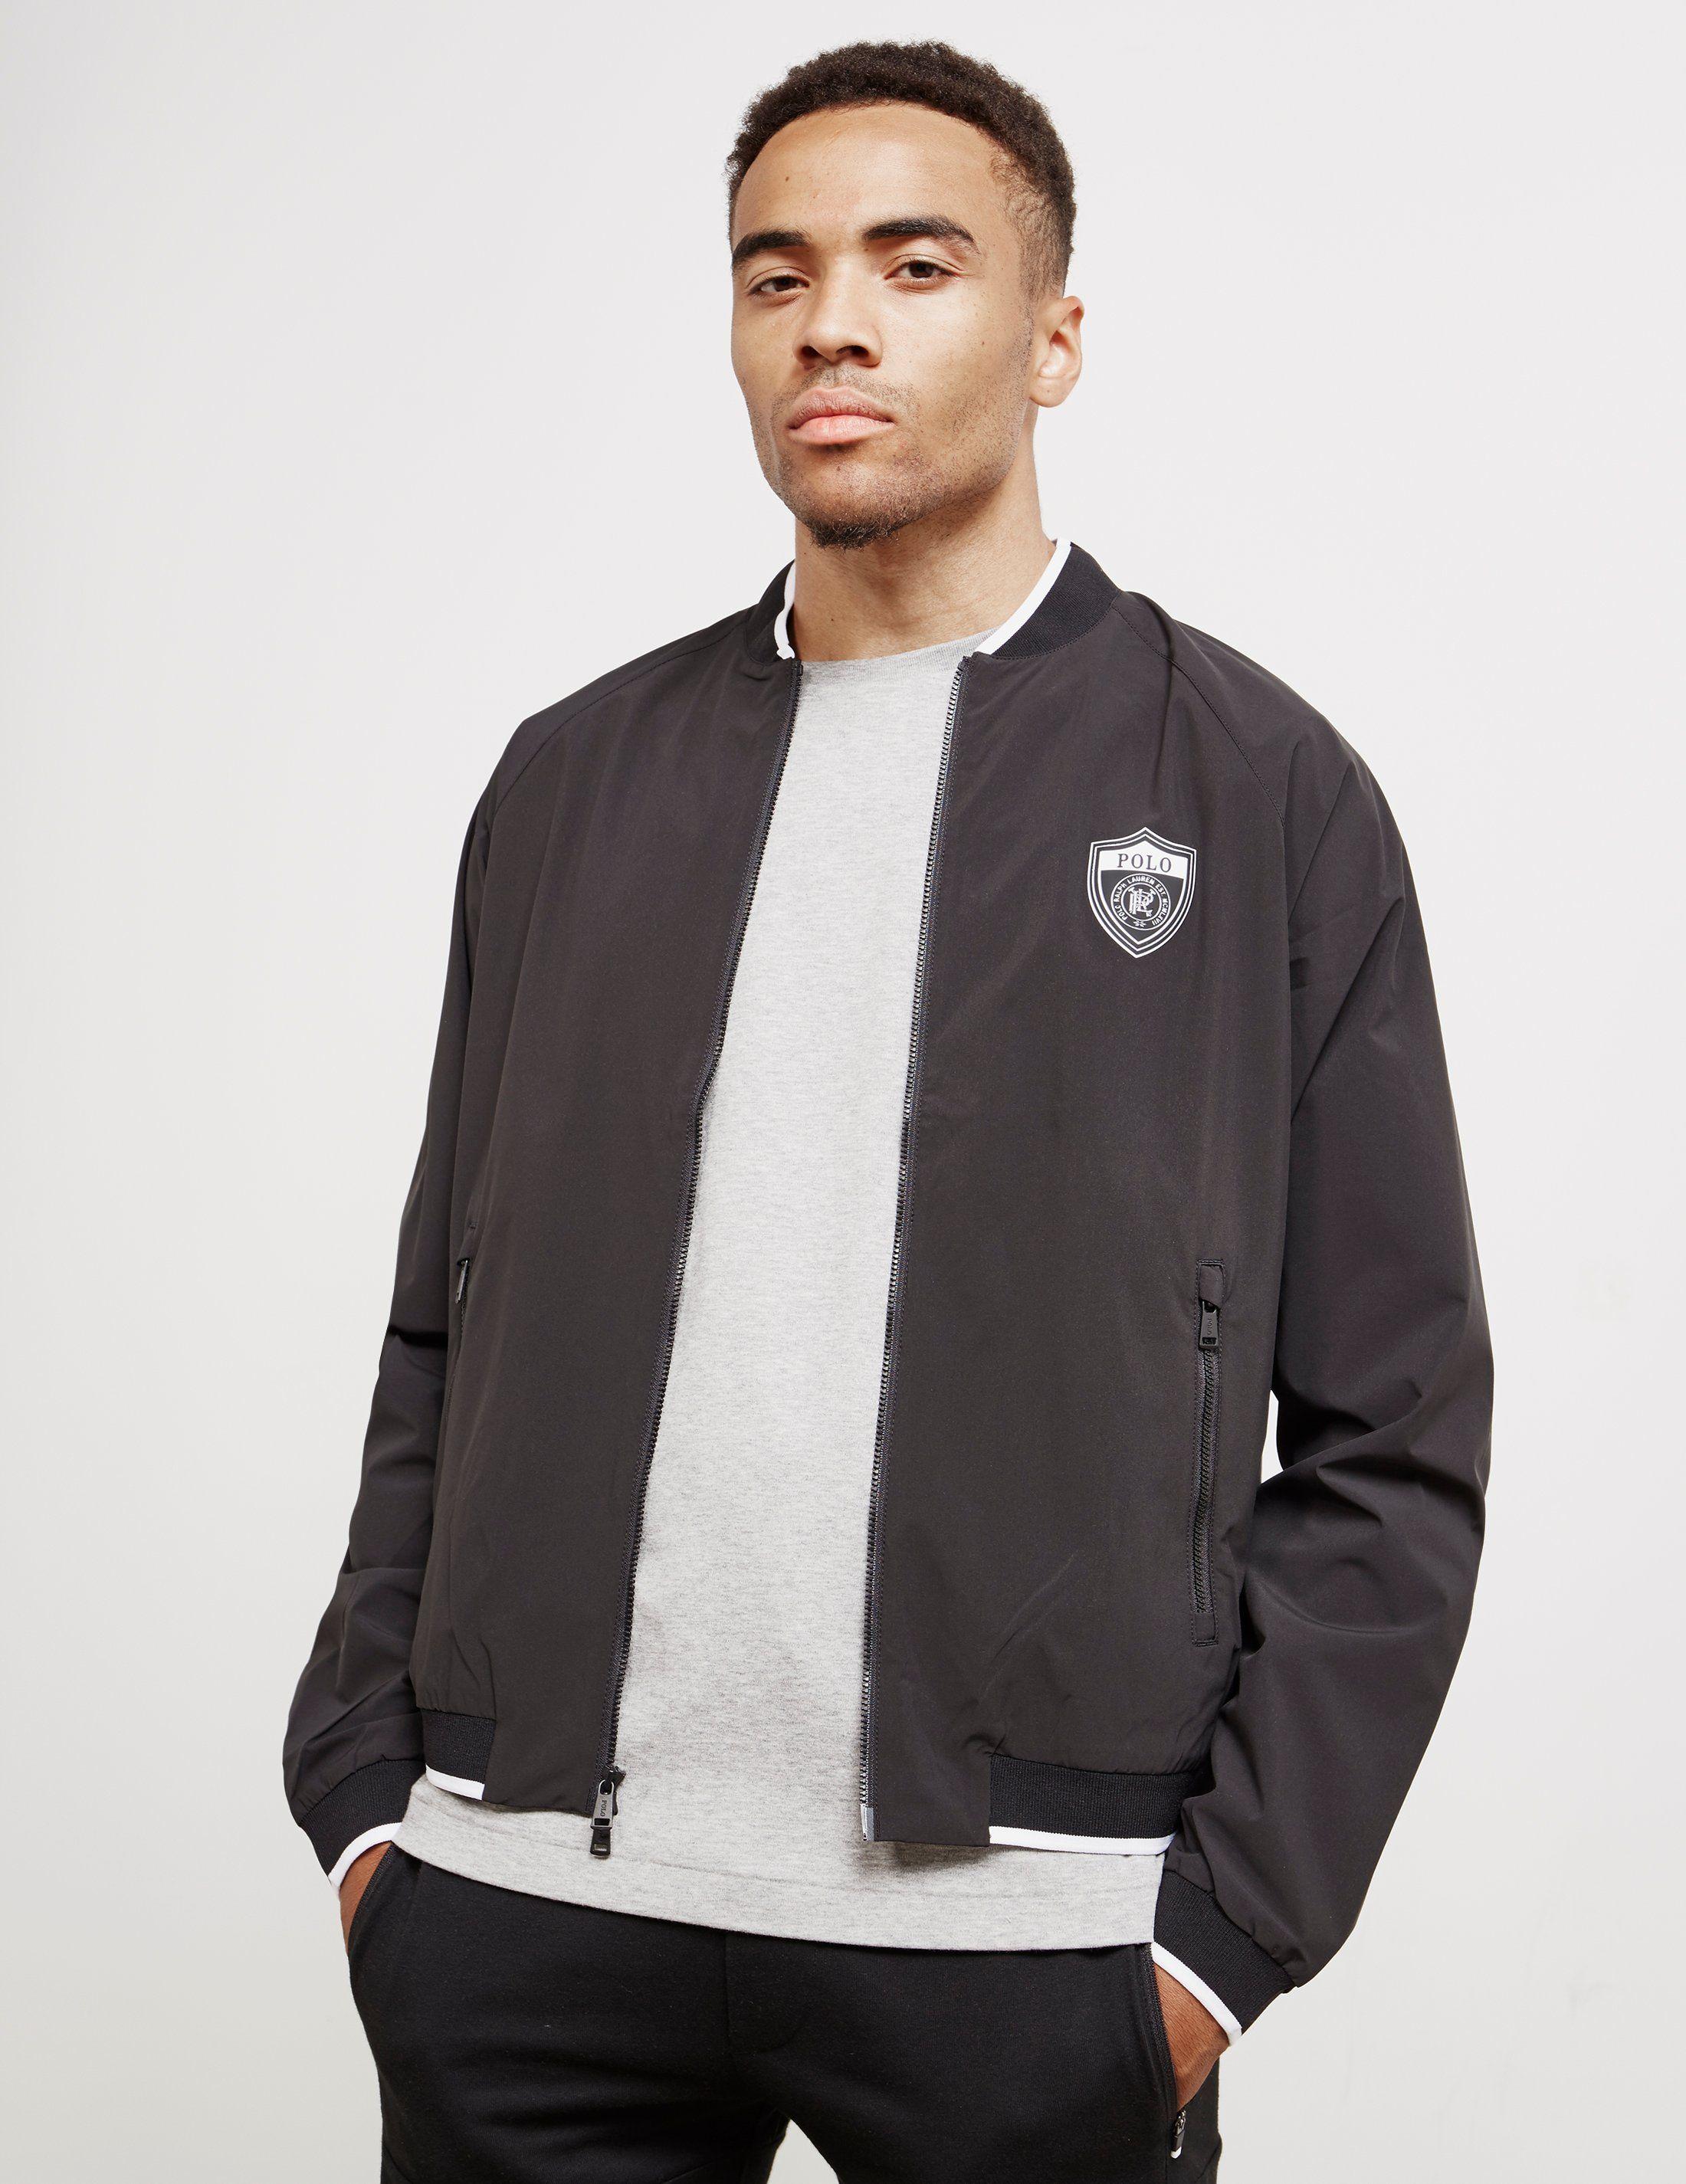 Polo Ralph Lauren Logo Bomber Jacket